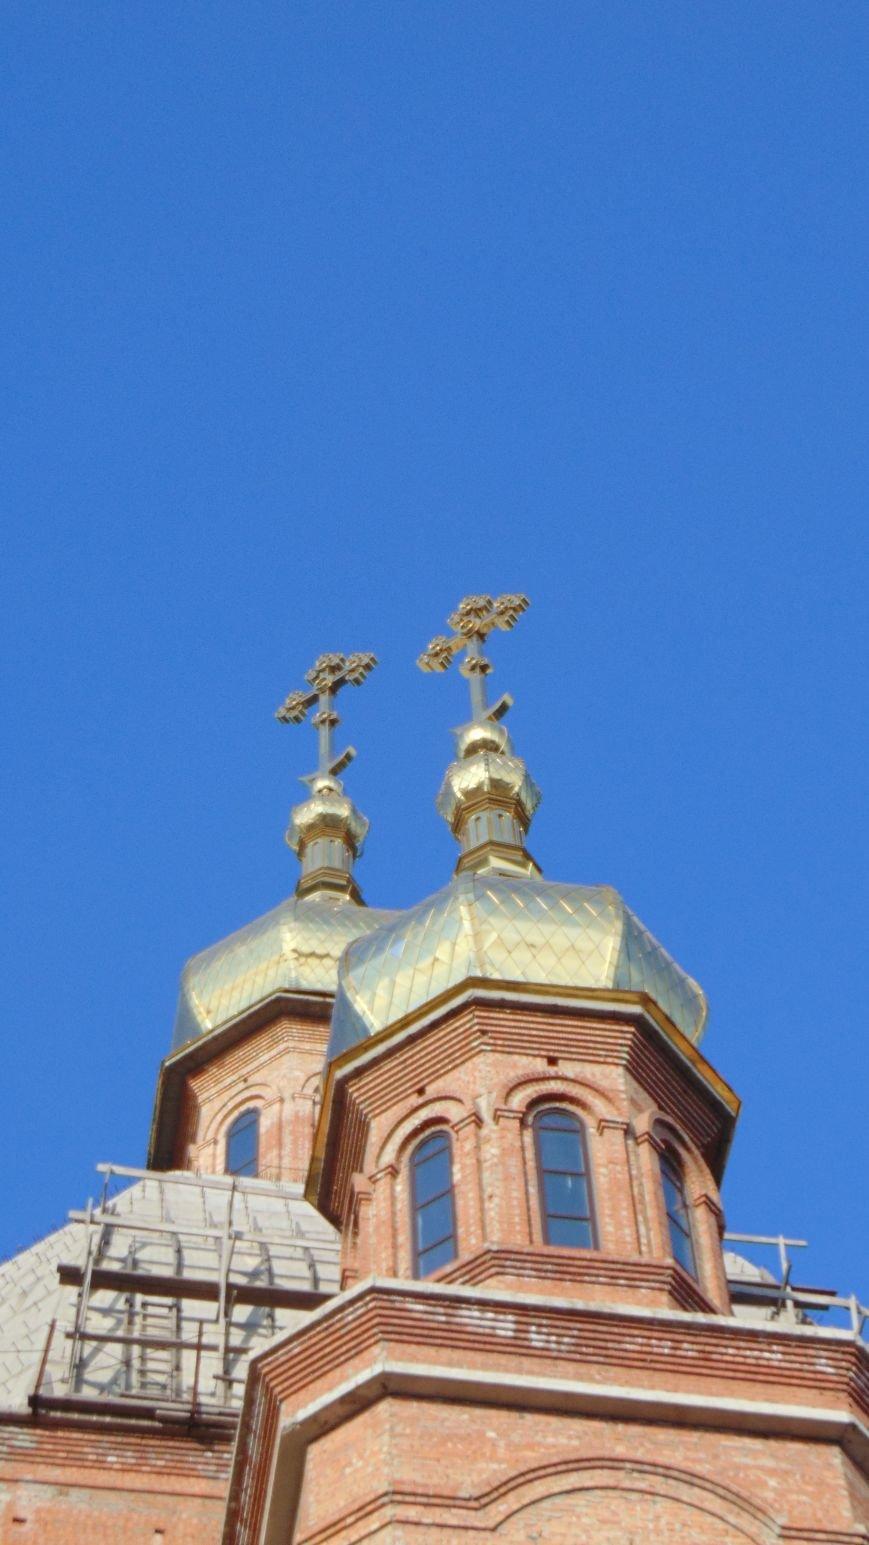 Фотопятница: «Город над головой» (фото) - фото 30